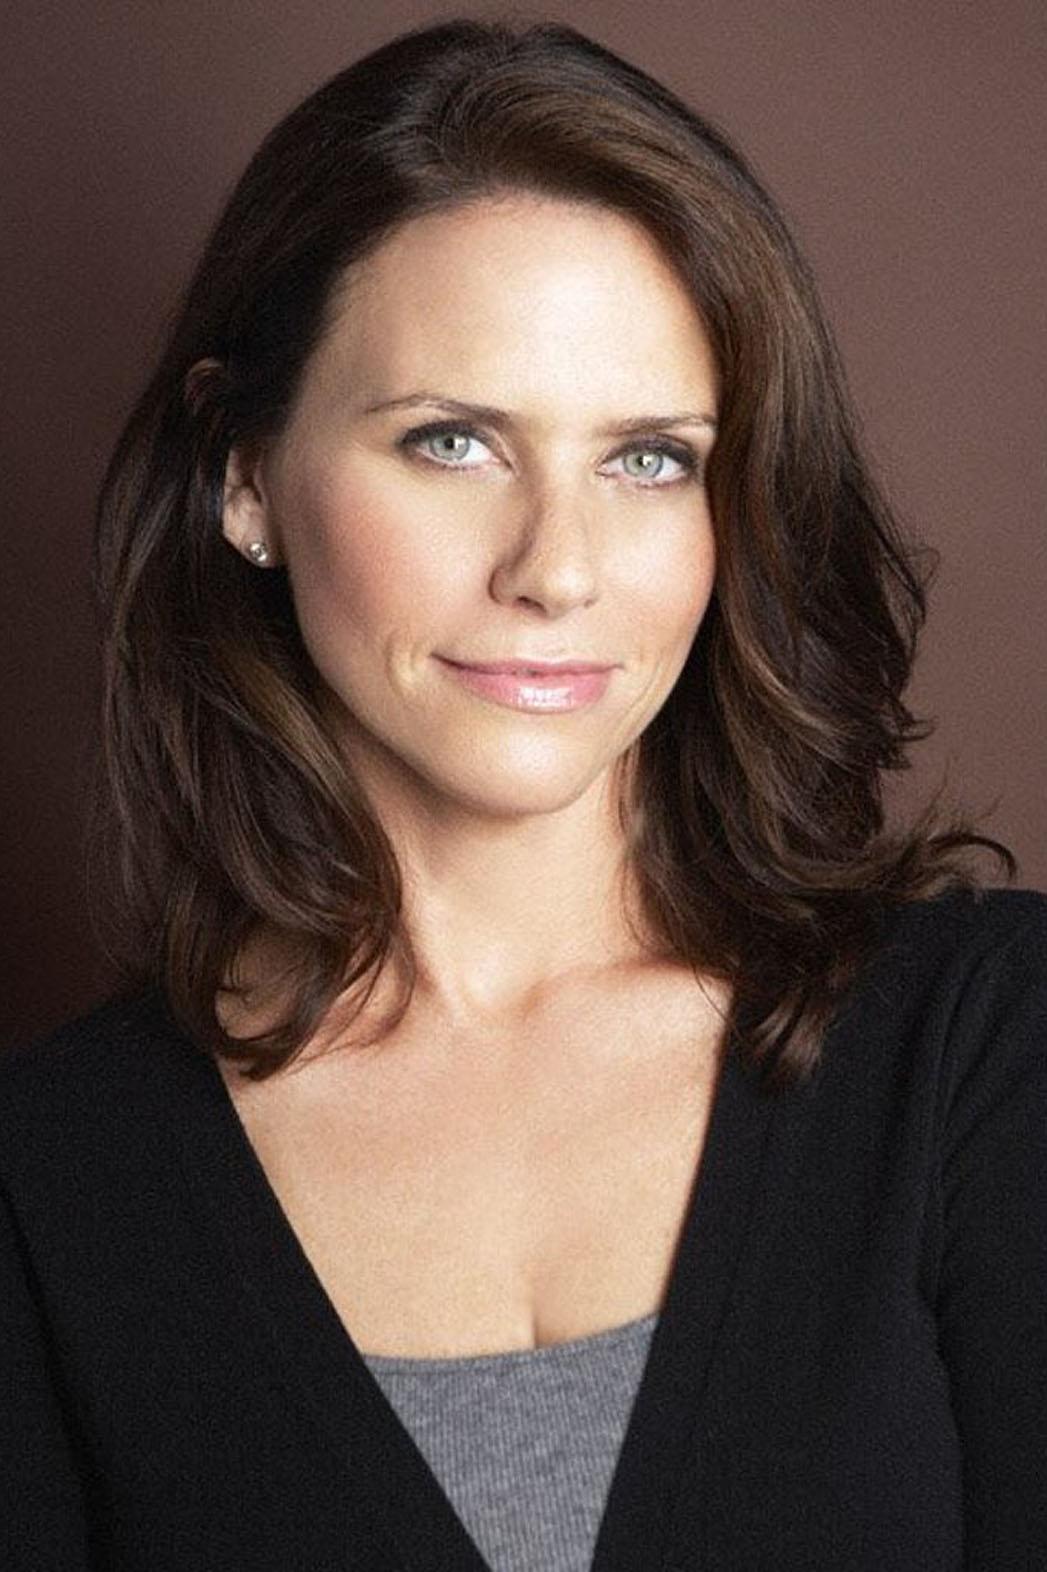 Amy Landecker Headshot - P 2014